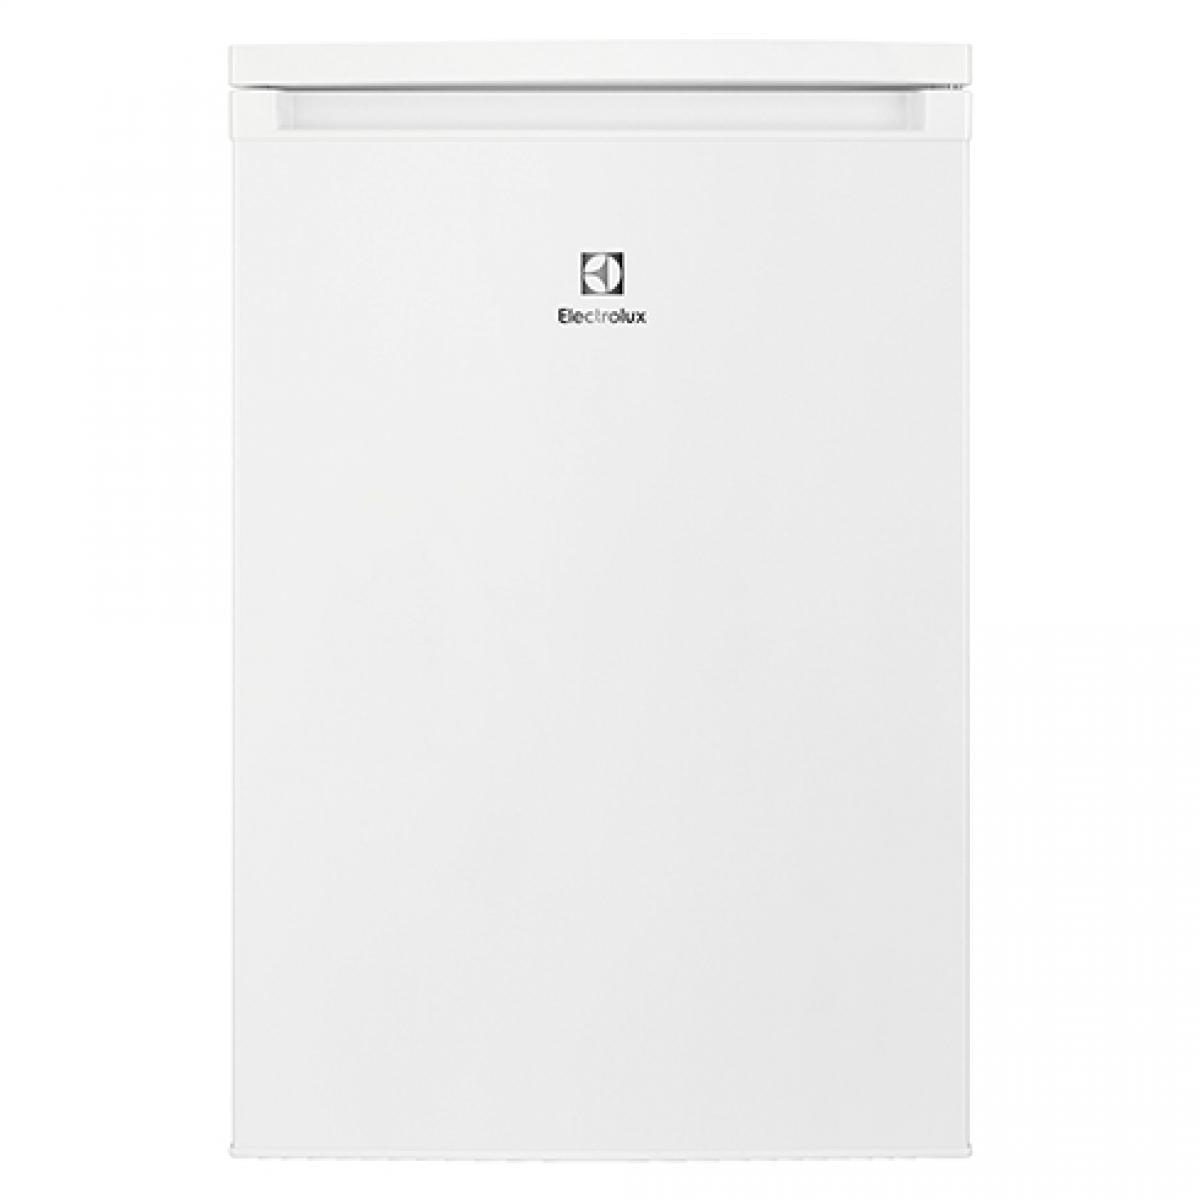 Electrolux Réfrigérateur table top ELECTROLUX, LXB1SE11W0